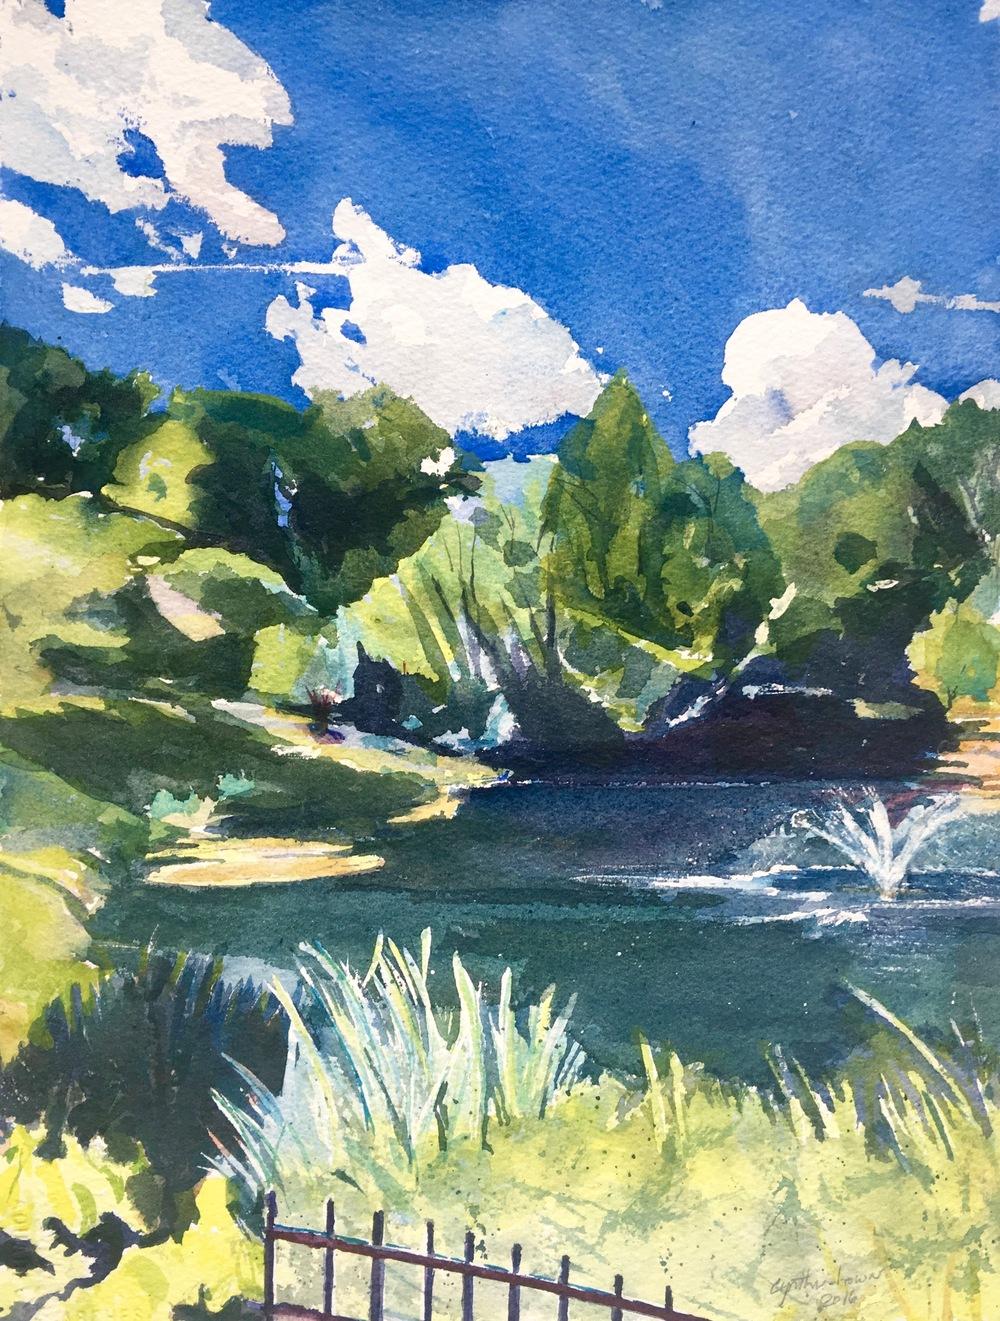 Hillandale Pond, (c) 2016